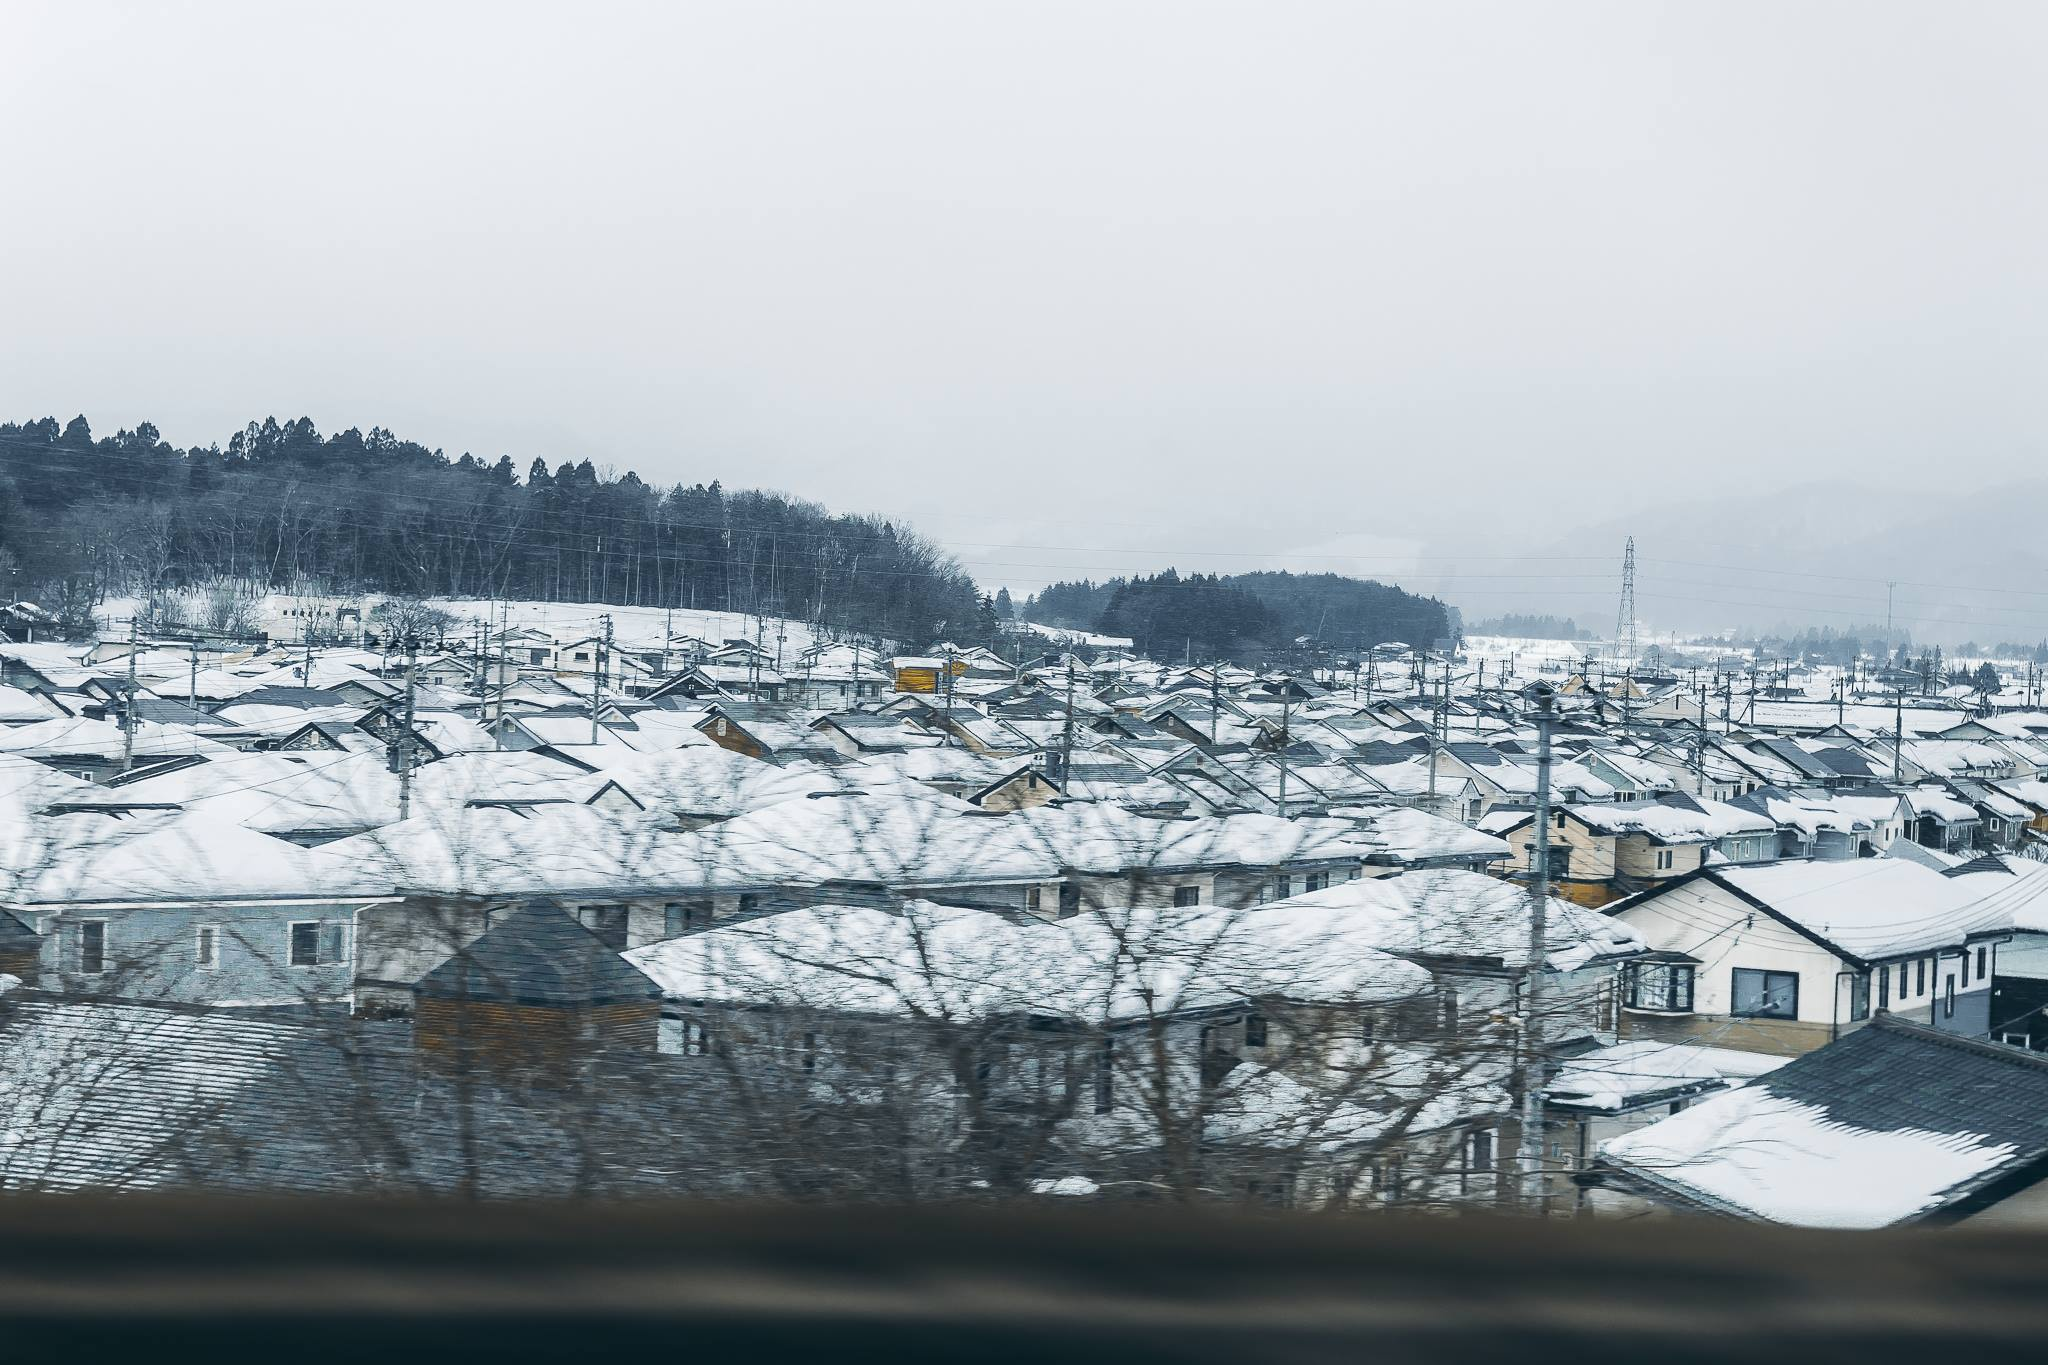 Hokkaido tuyet trang, noi dang den nhat mua dong o Nhat Ban hinh anh 23